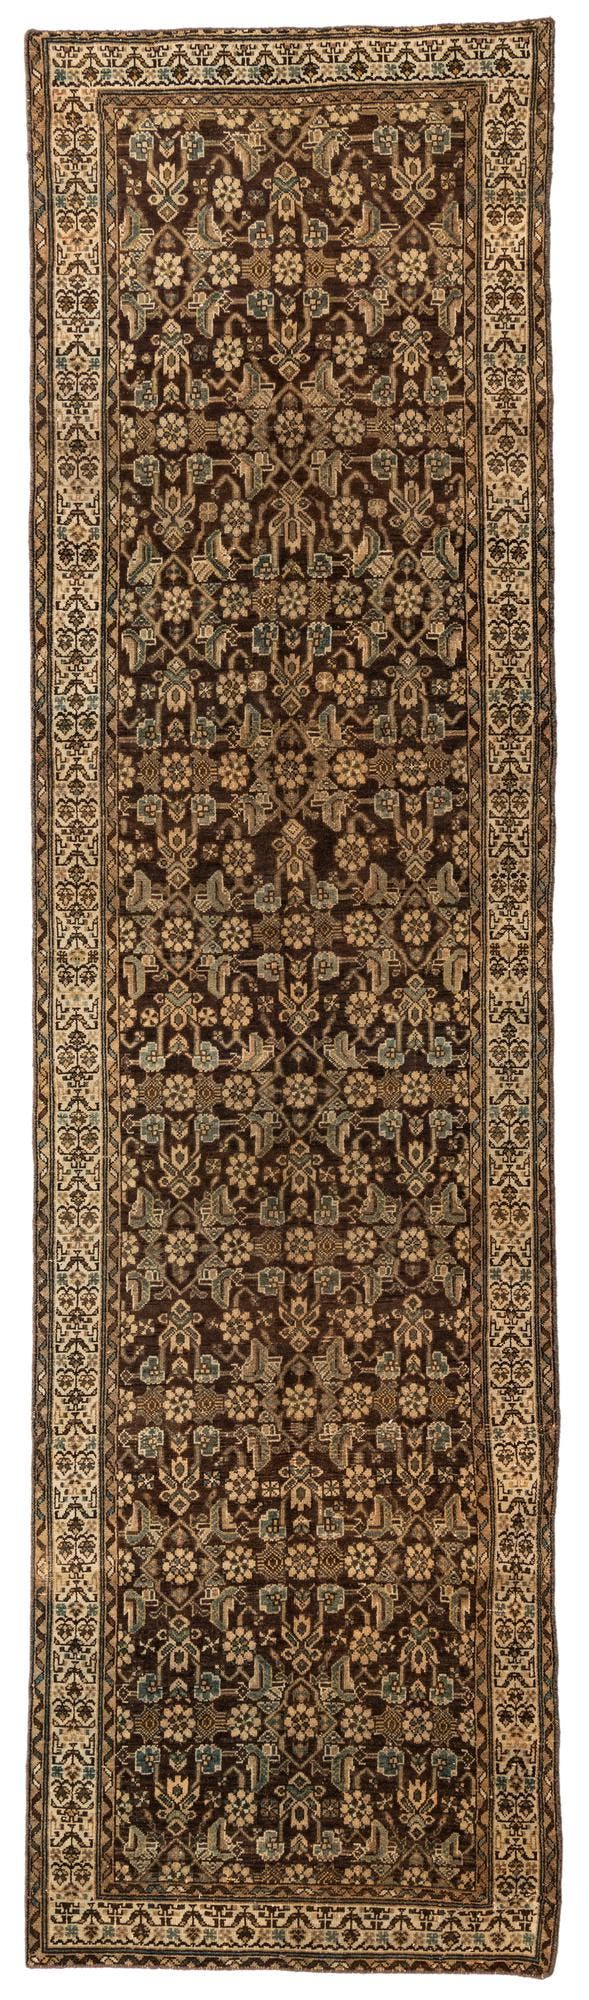 3' 6 x 12' 10 Ultra Vintage Persian Runner Rug main image